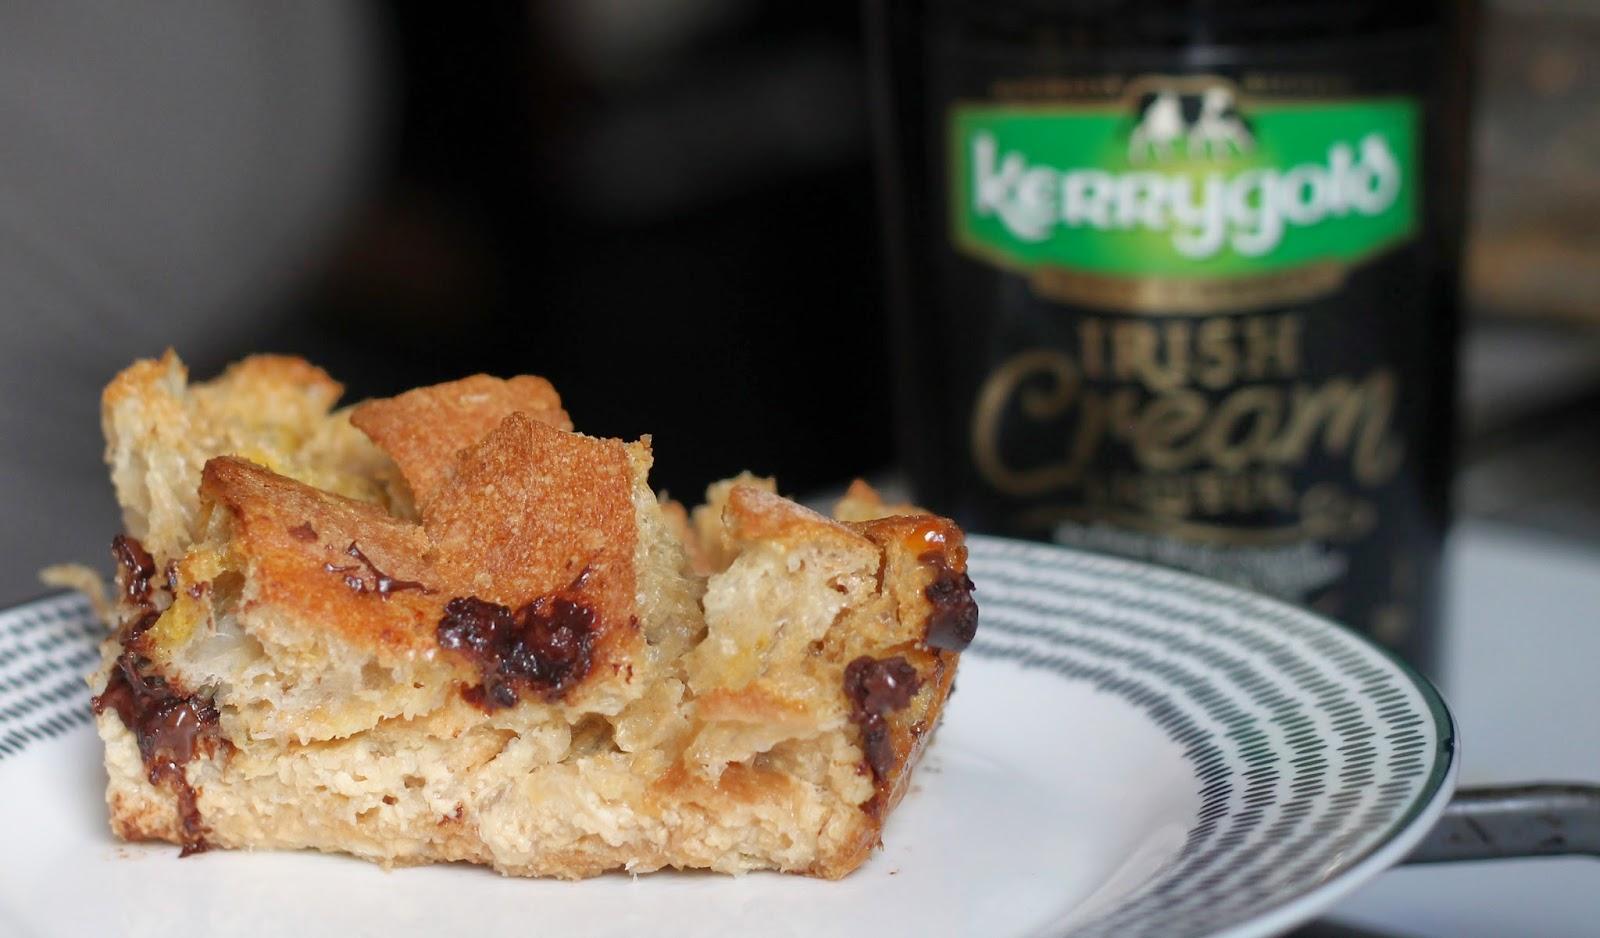 kerrygold irish cream, bailey's french toast, baked french  toast, brunch recipes, easy brunch recipes, easy french toast